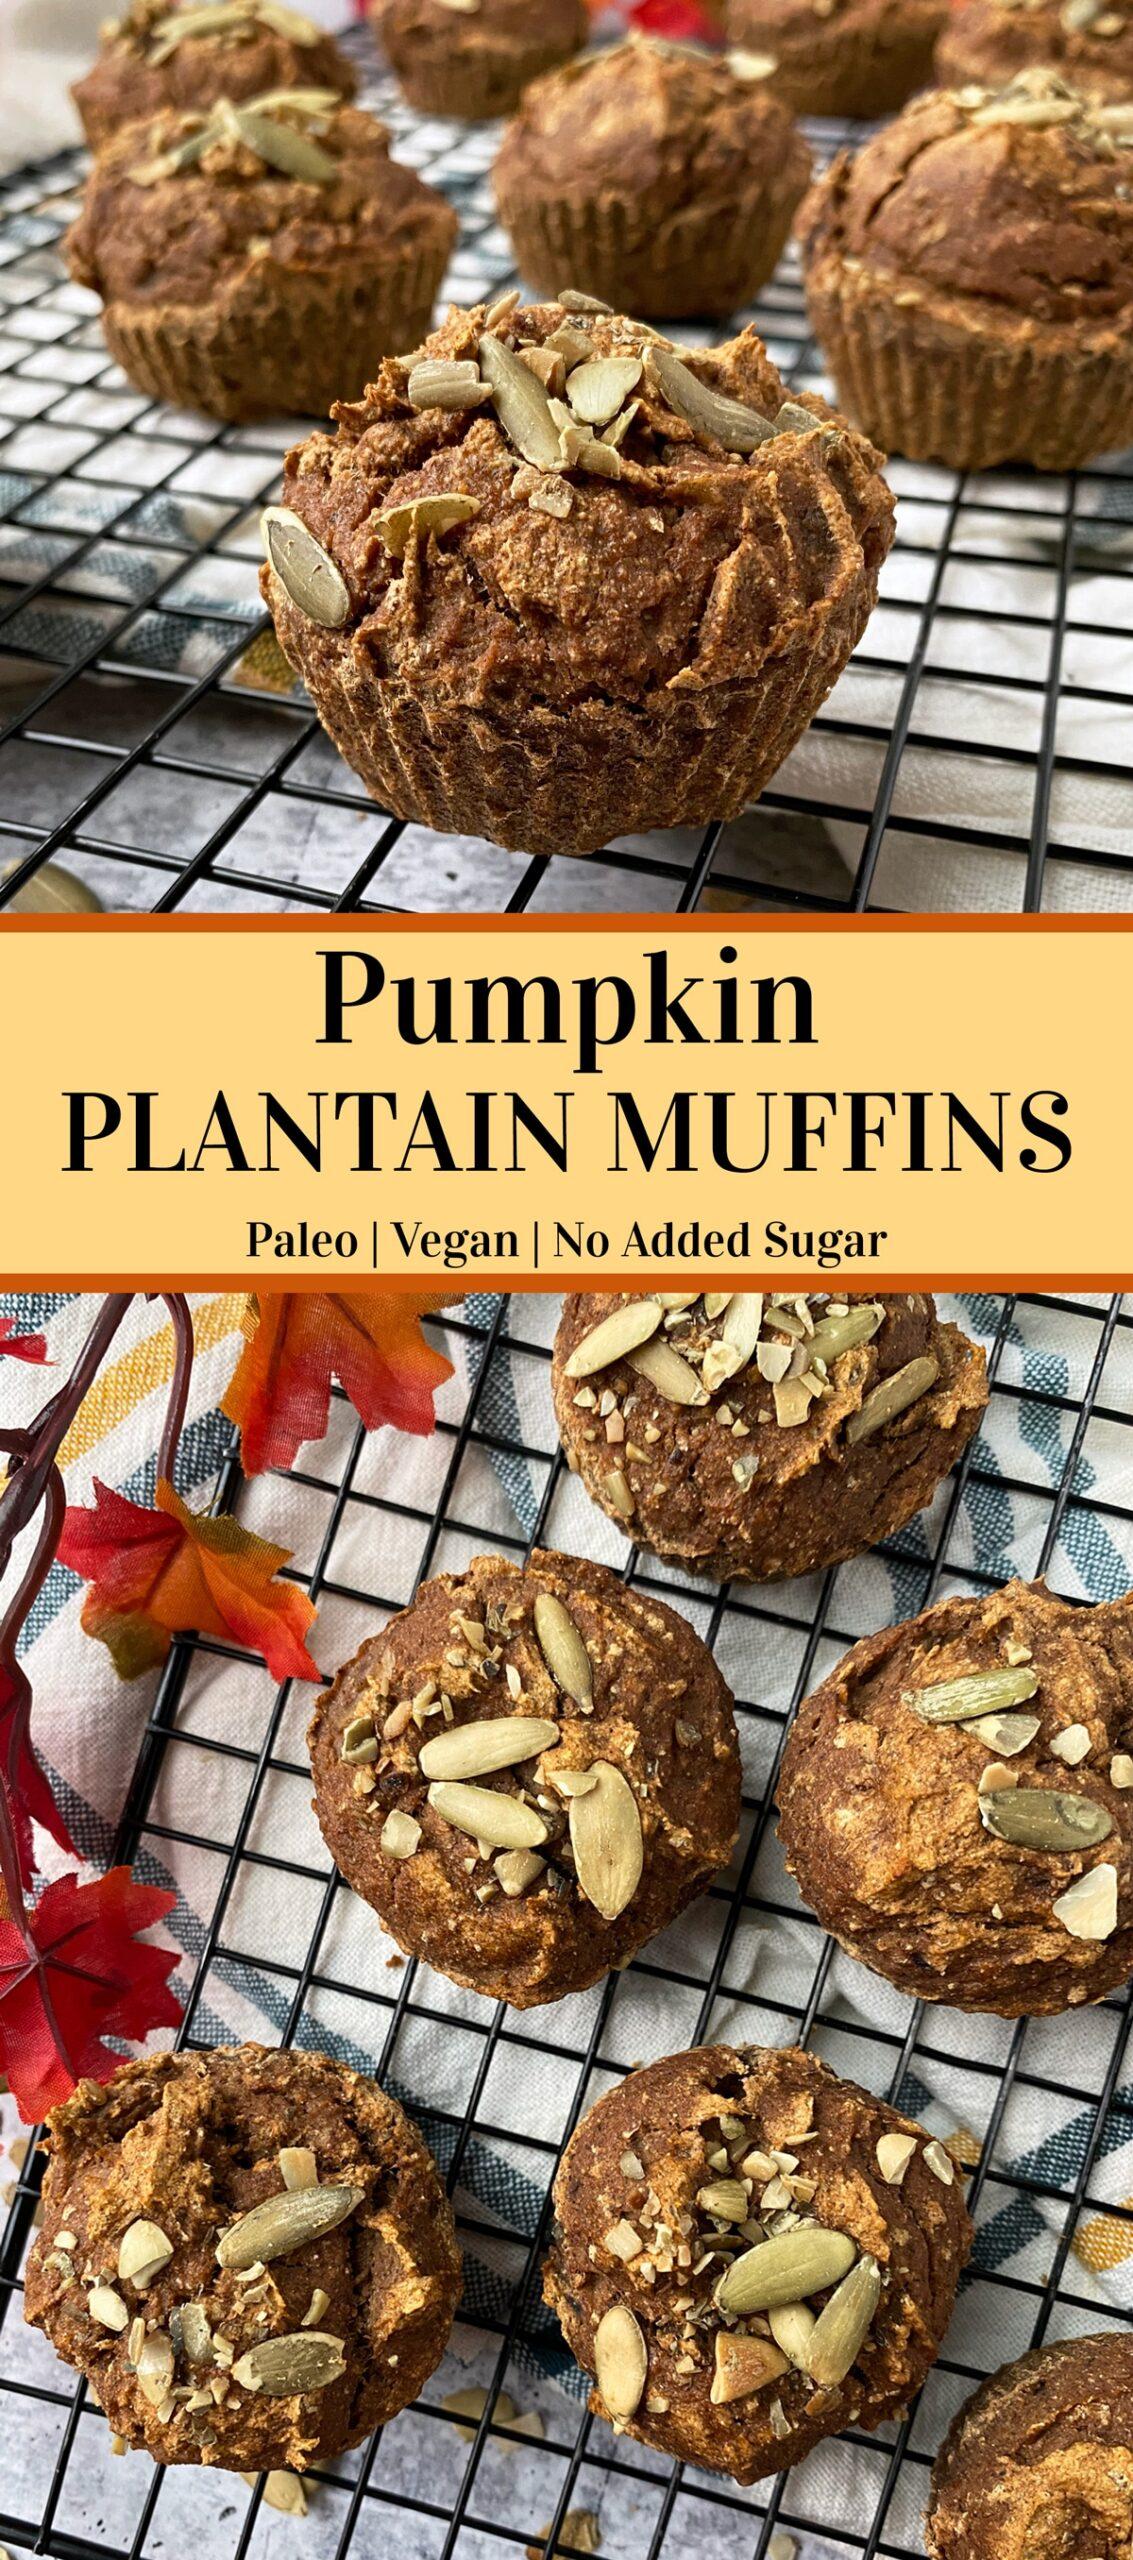 Plantain-Muffin-Recipe---Paleo-Vegan